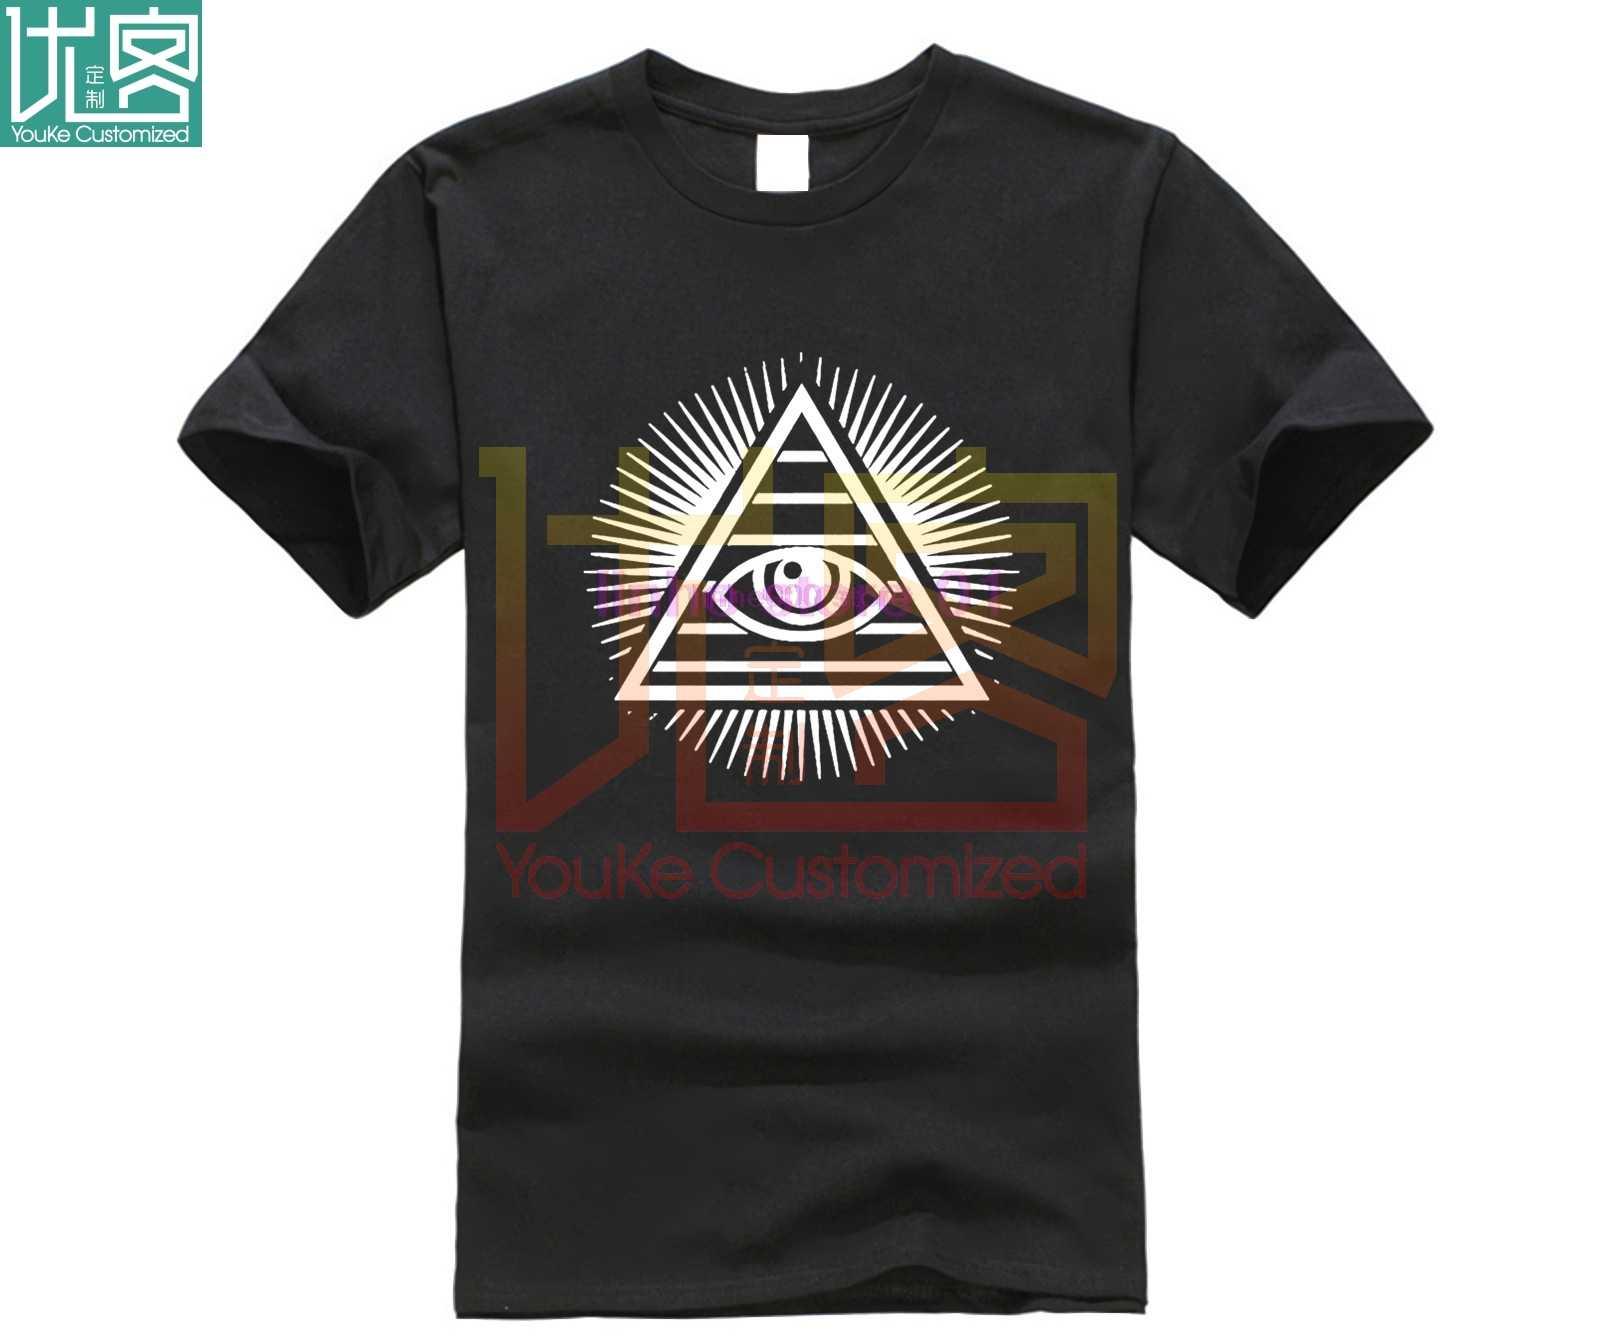 Disobey NEW WORLD ORDER T เสื้อด้านบน Anonymous Revolution Illuminati 4chan Eye แฟชั่นผู้ชายพิมพ์ T เสื้อ